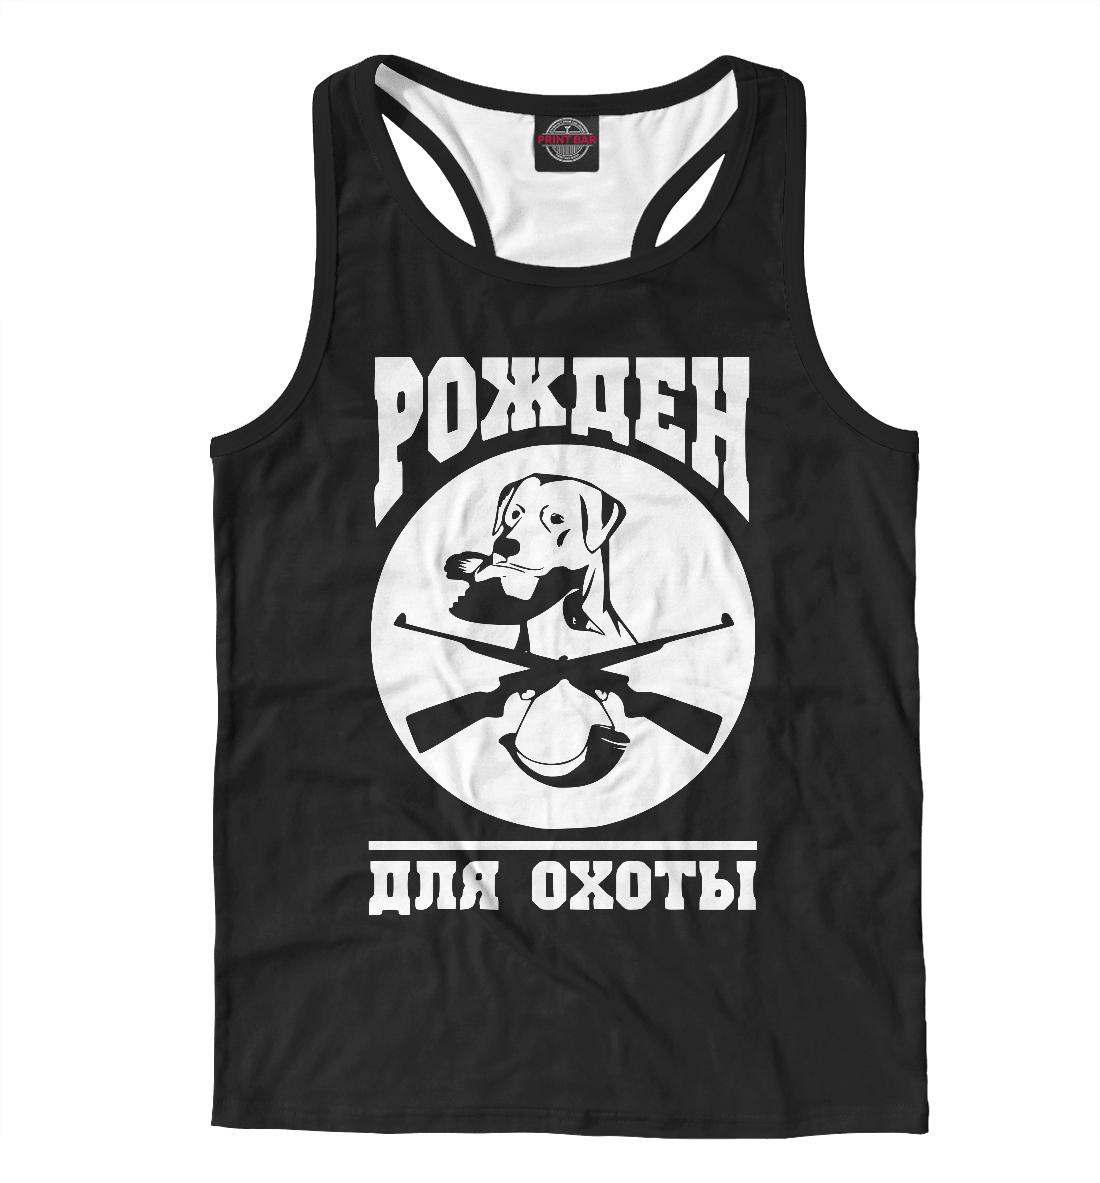 Купить Рожден для Охоты, Printbar, Майки борцовки, OHT-821127-mayb-2